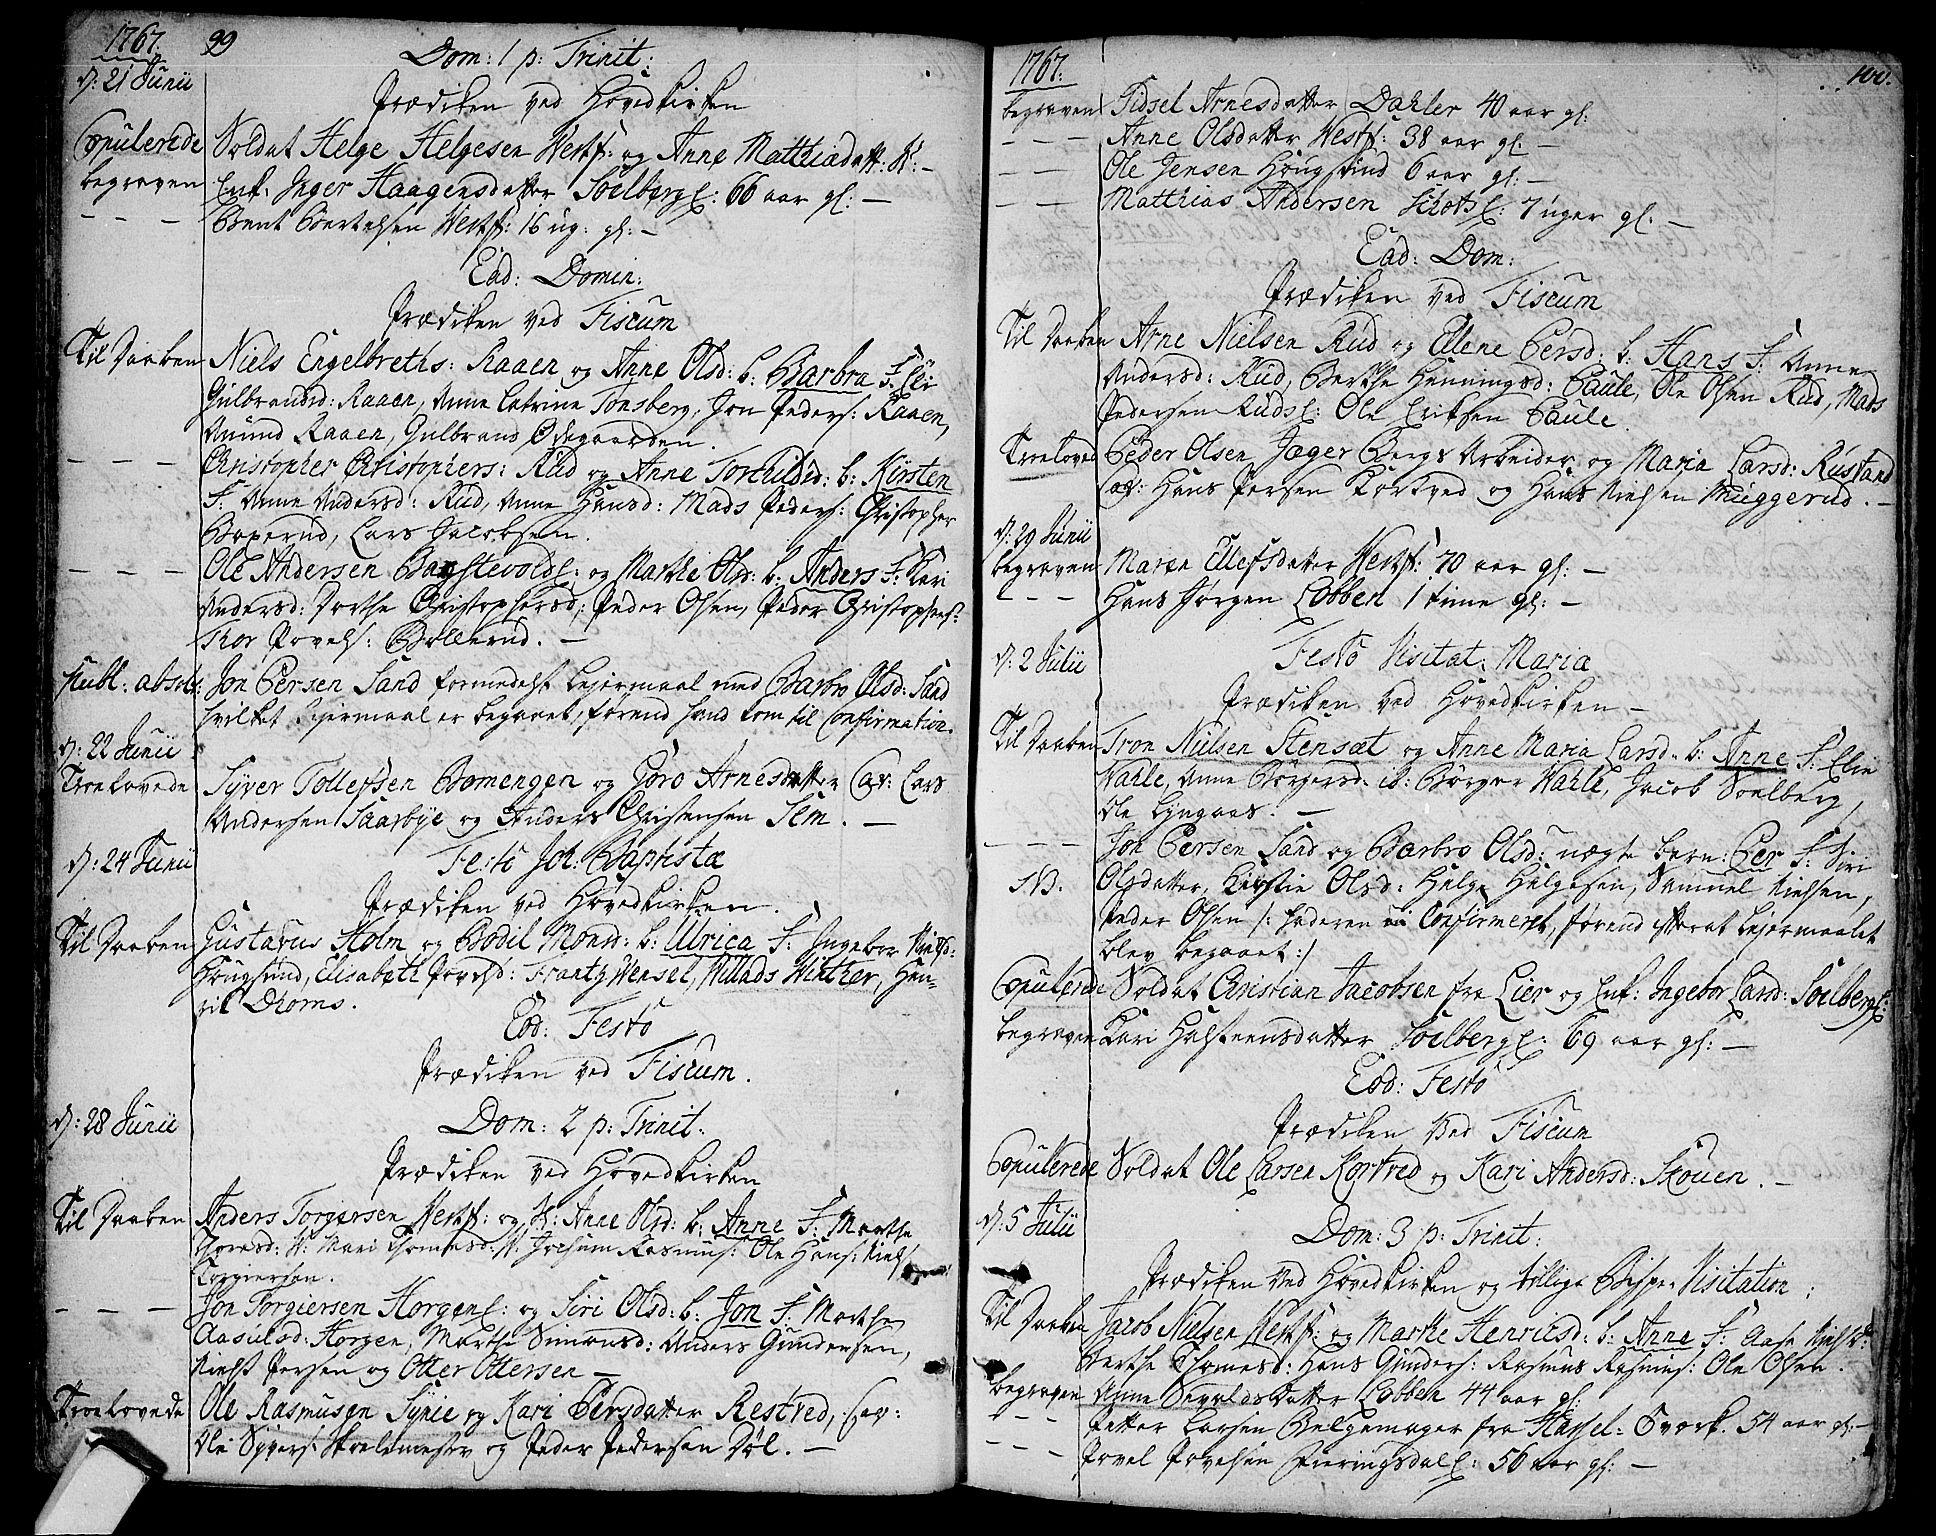 SAKO, Eiker kirkebøker, F/Fa/L0008: Ministerialbok nr. I 8, 1764-1788, s. 99-100